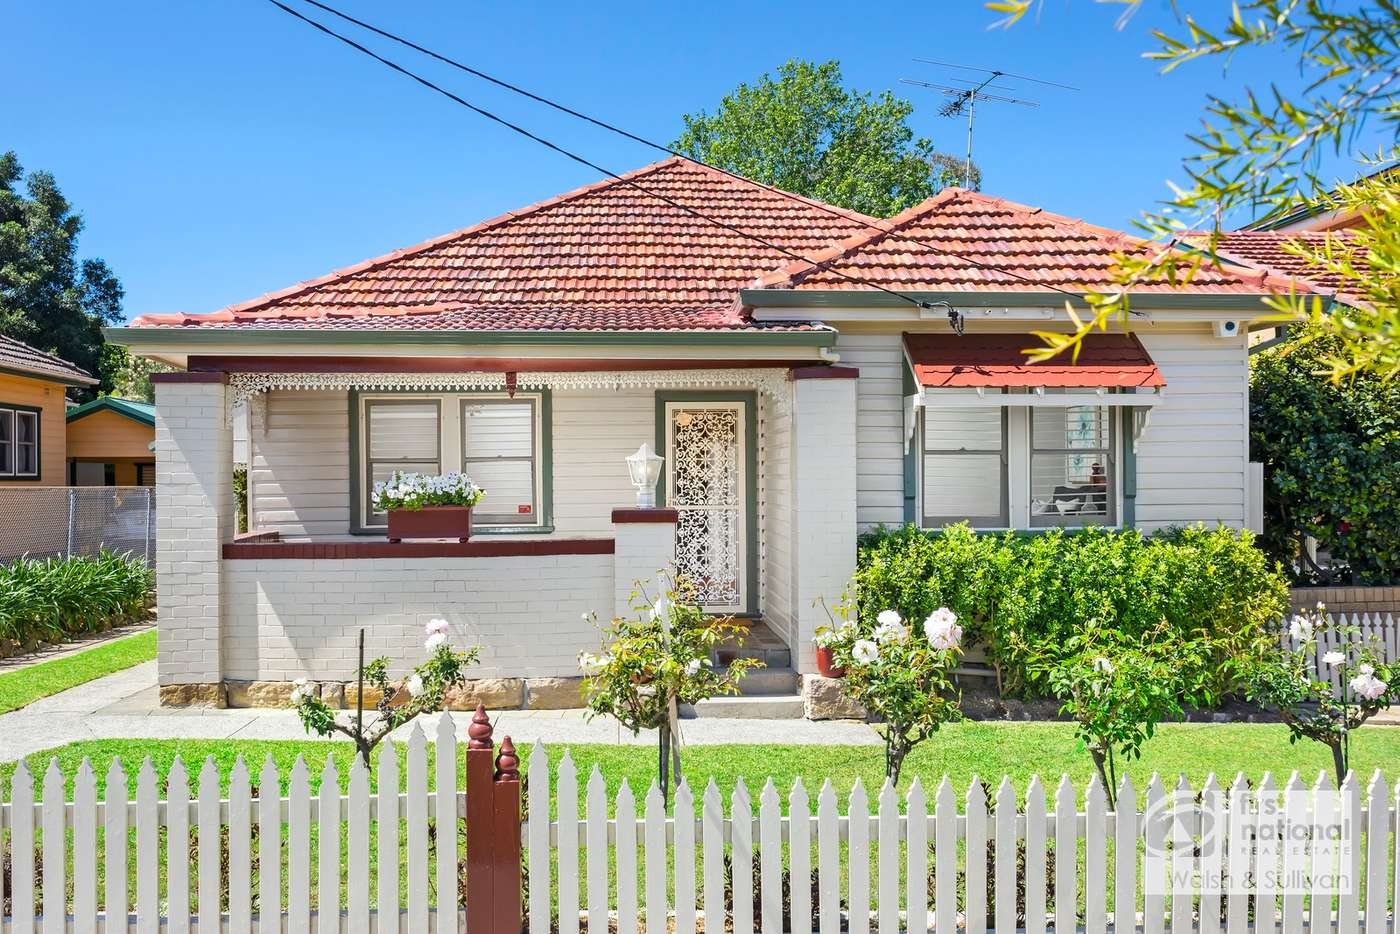 Main view of Homely house listing, 13 Hartland Street, Northmead NSW 2152